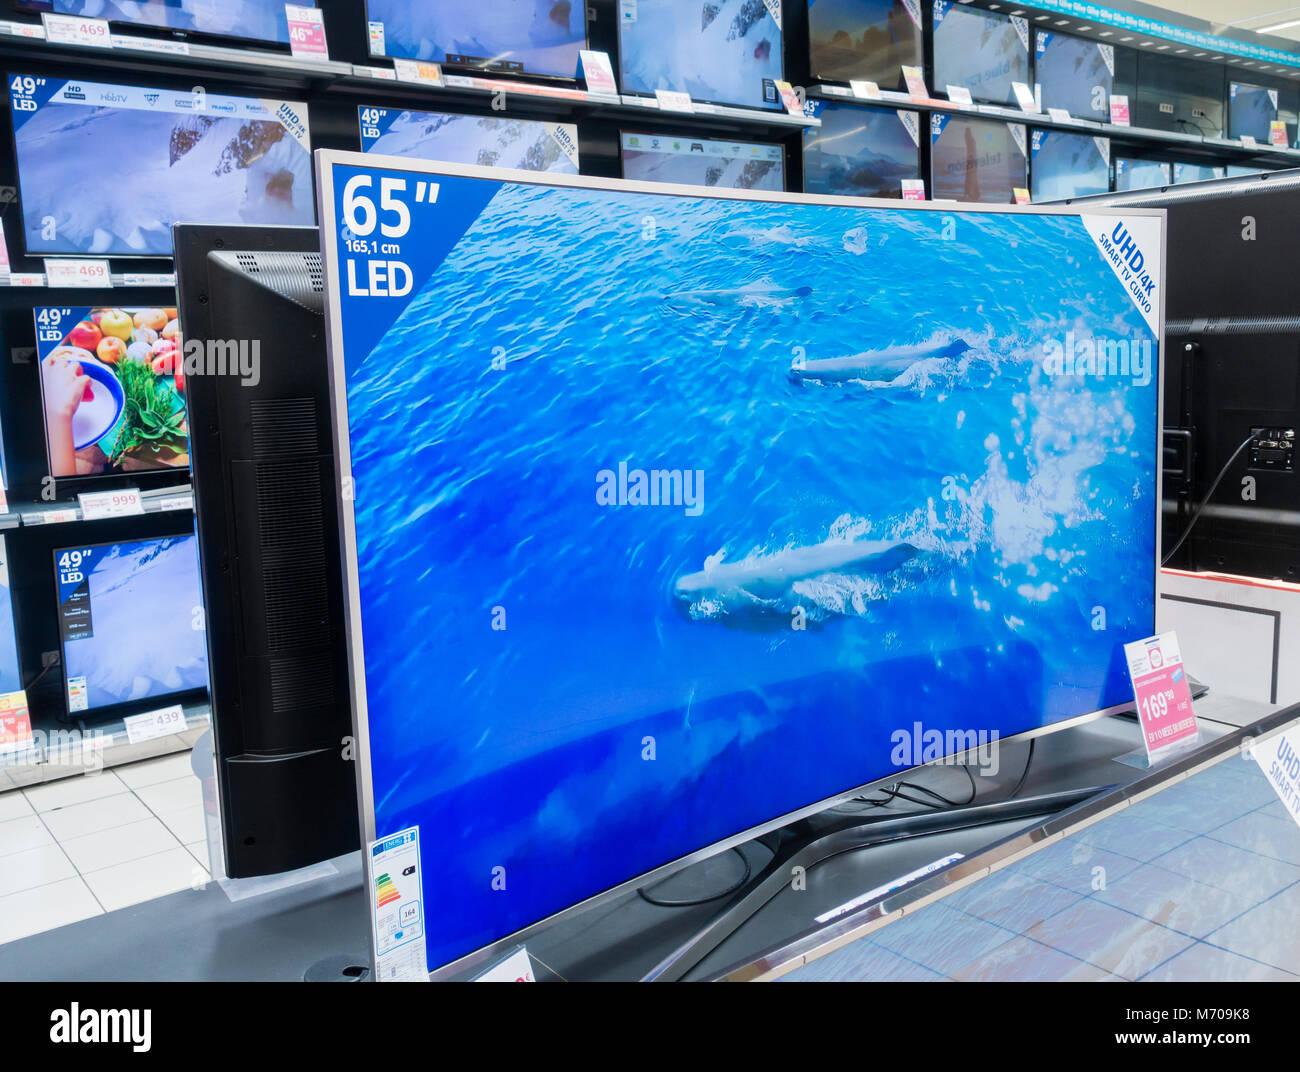 Samsung 65' UHD 4K curved smart TV in Spanish supermarket - Stock Image